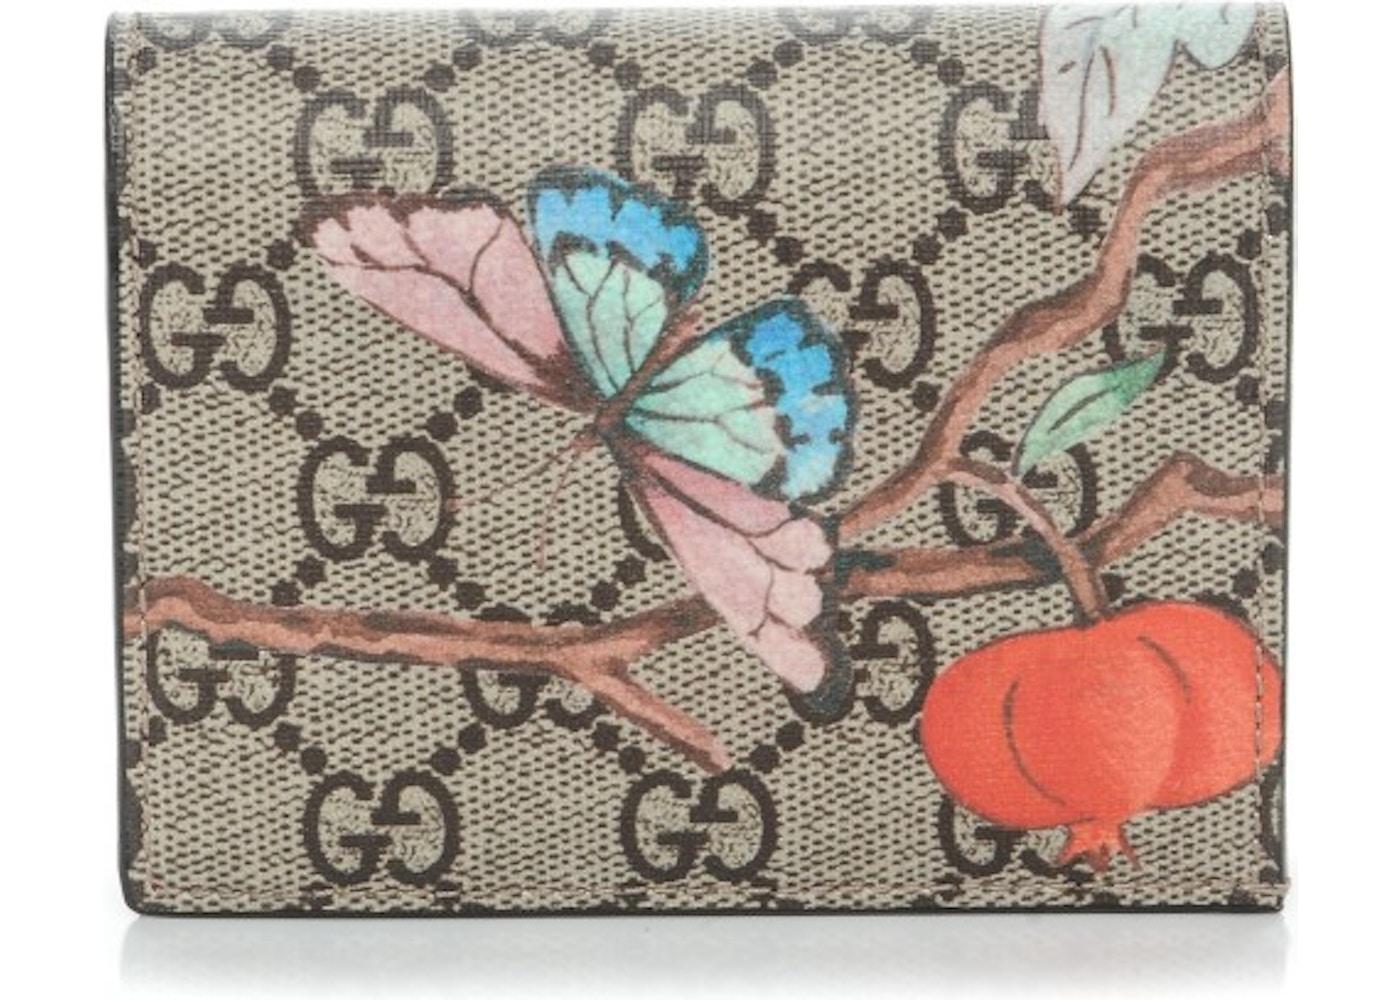 81355339f7857f Gucci Card Case Wallet Monogram GG Supreme Tian Print Brown ...